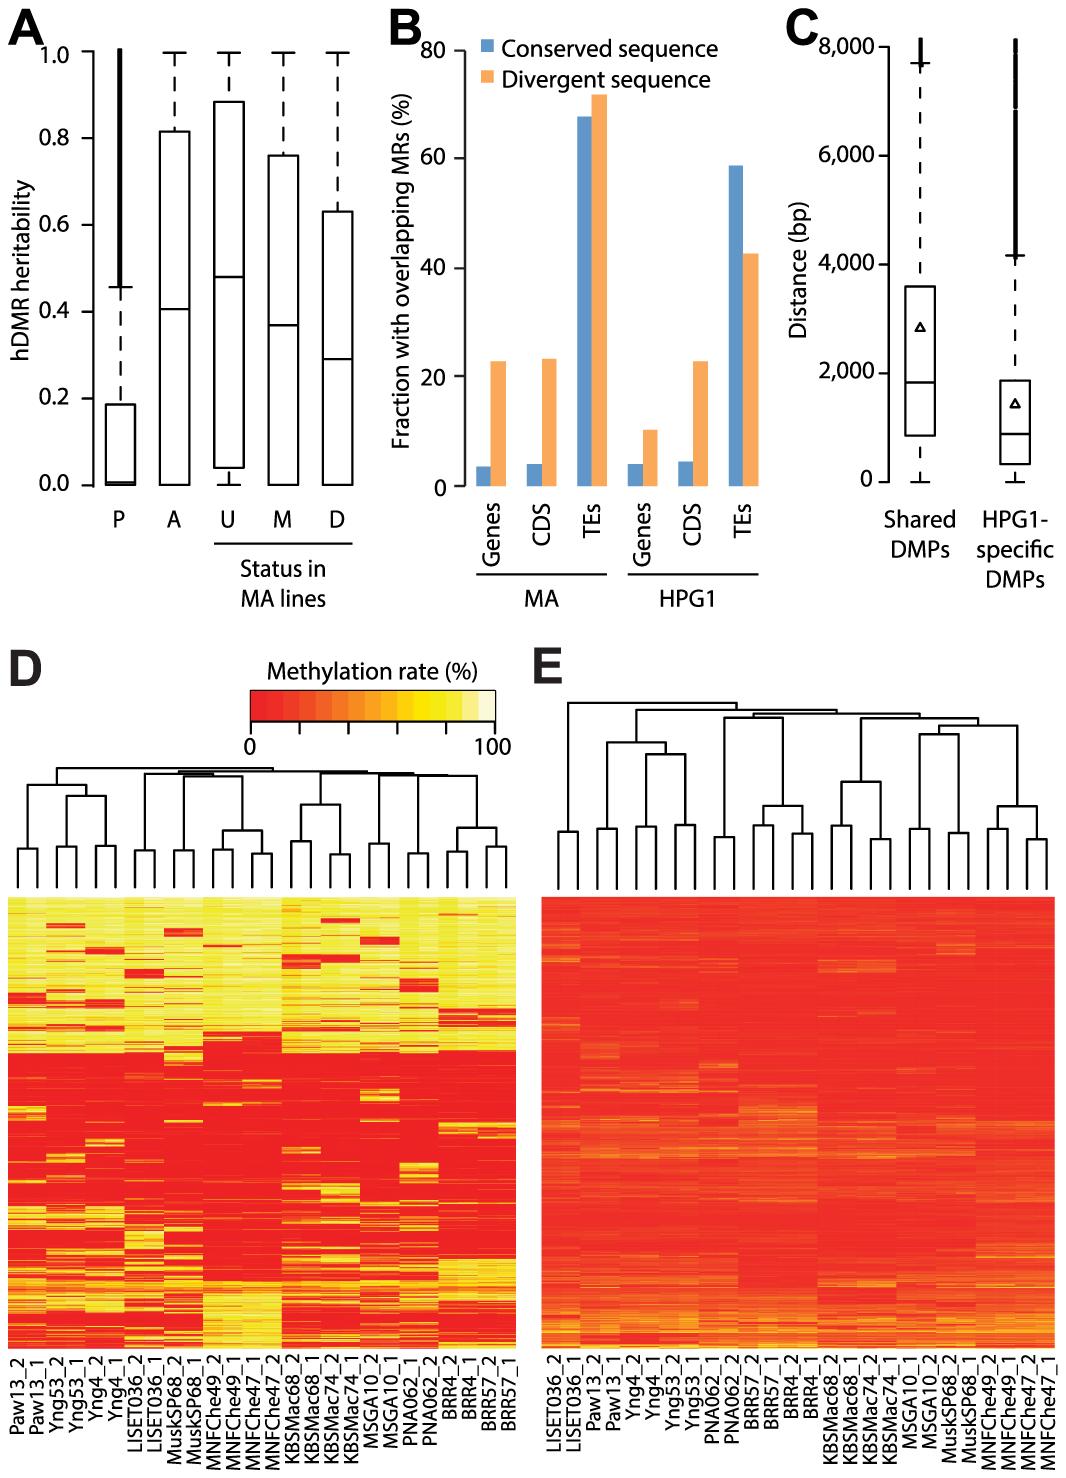 Genetic effects on epigenetic variation.